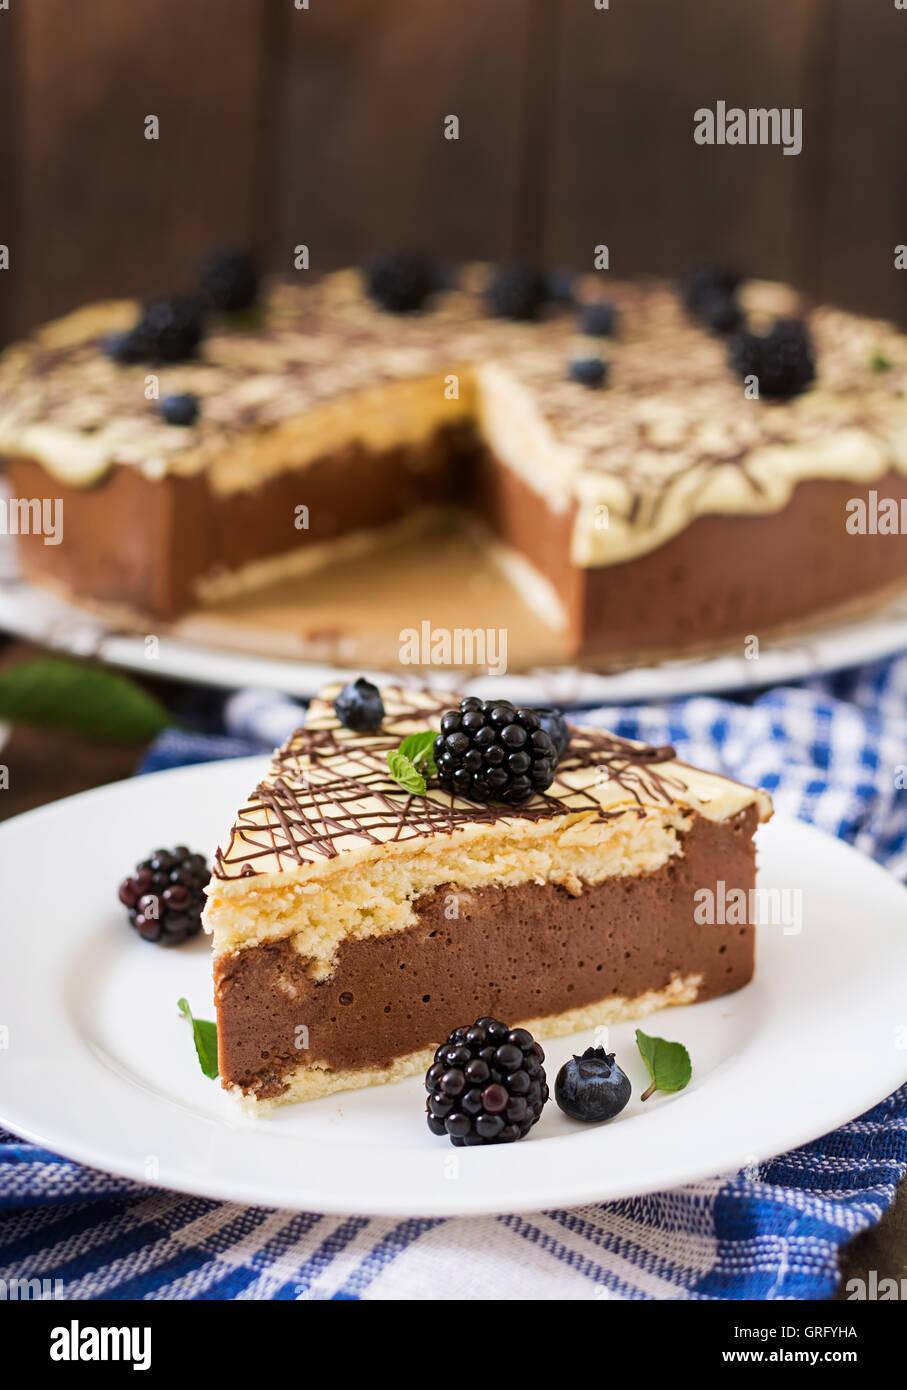 Chocolate Cake 'Bird's milk' - Stock Image